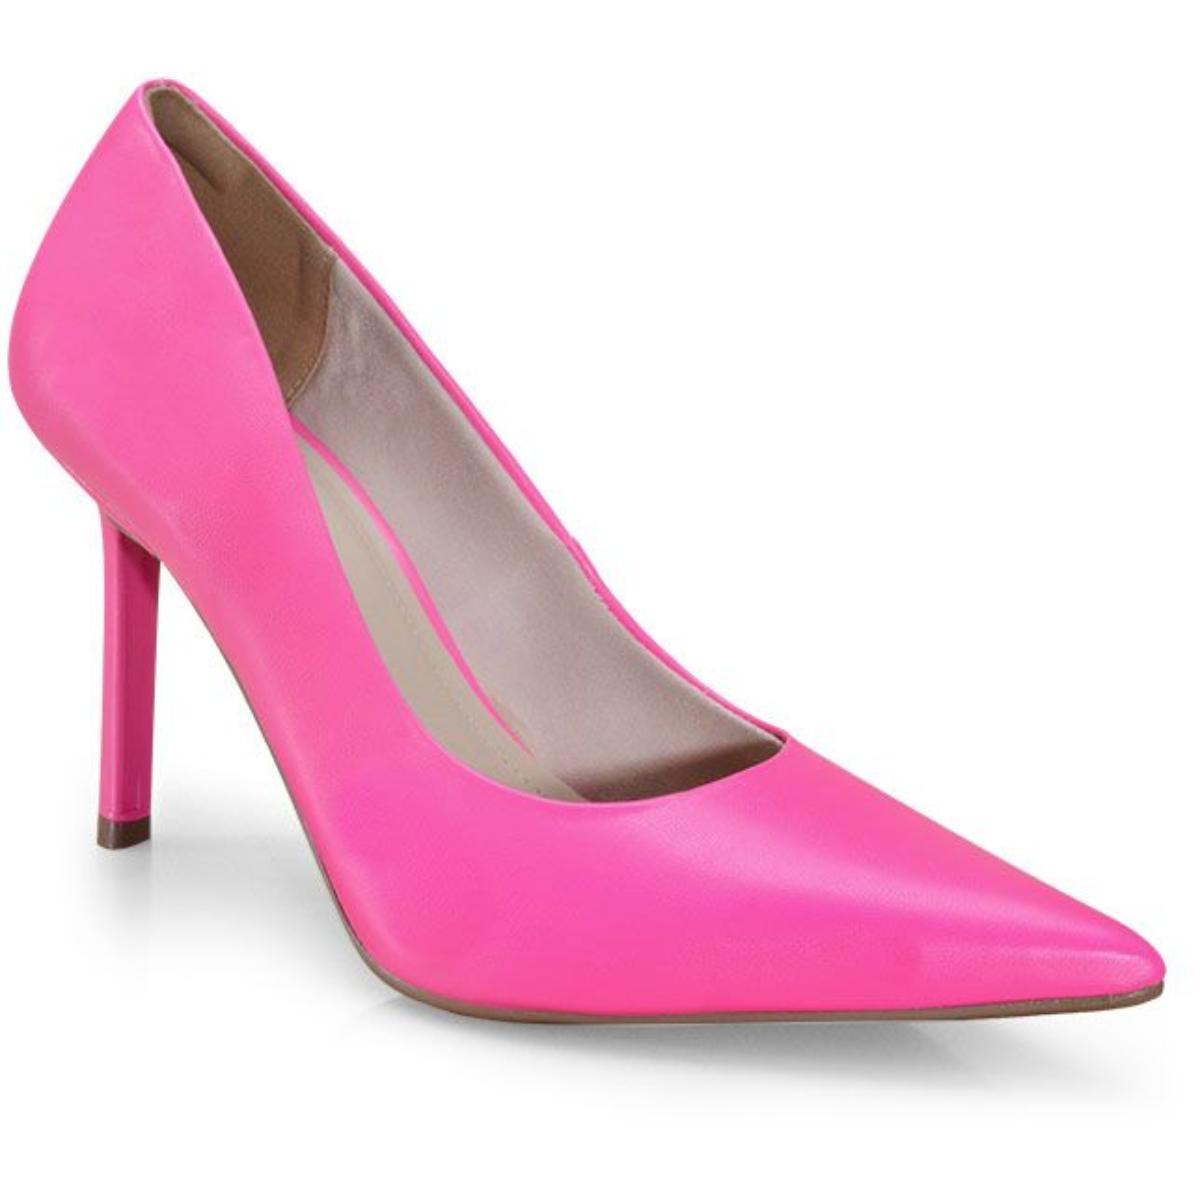 Sapato Feminino Via Marte 21-13301-01 Magenta